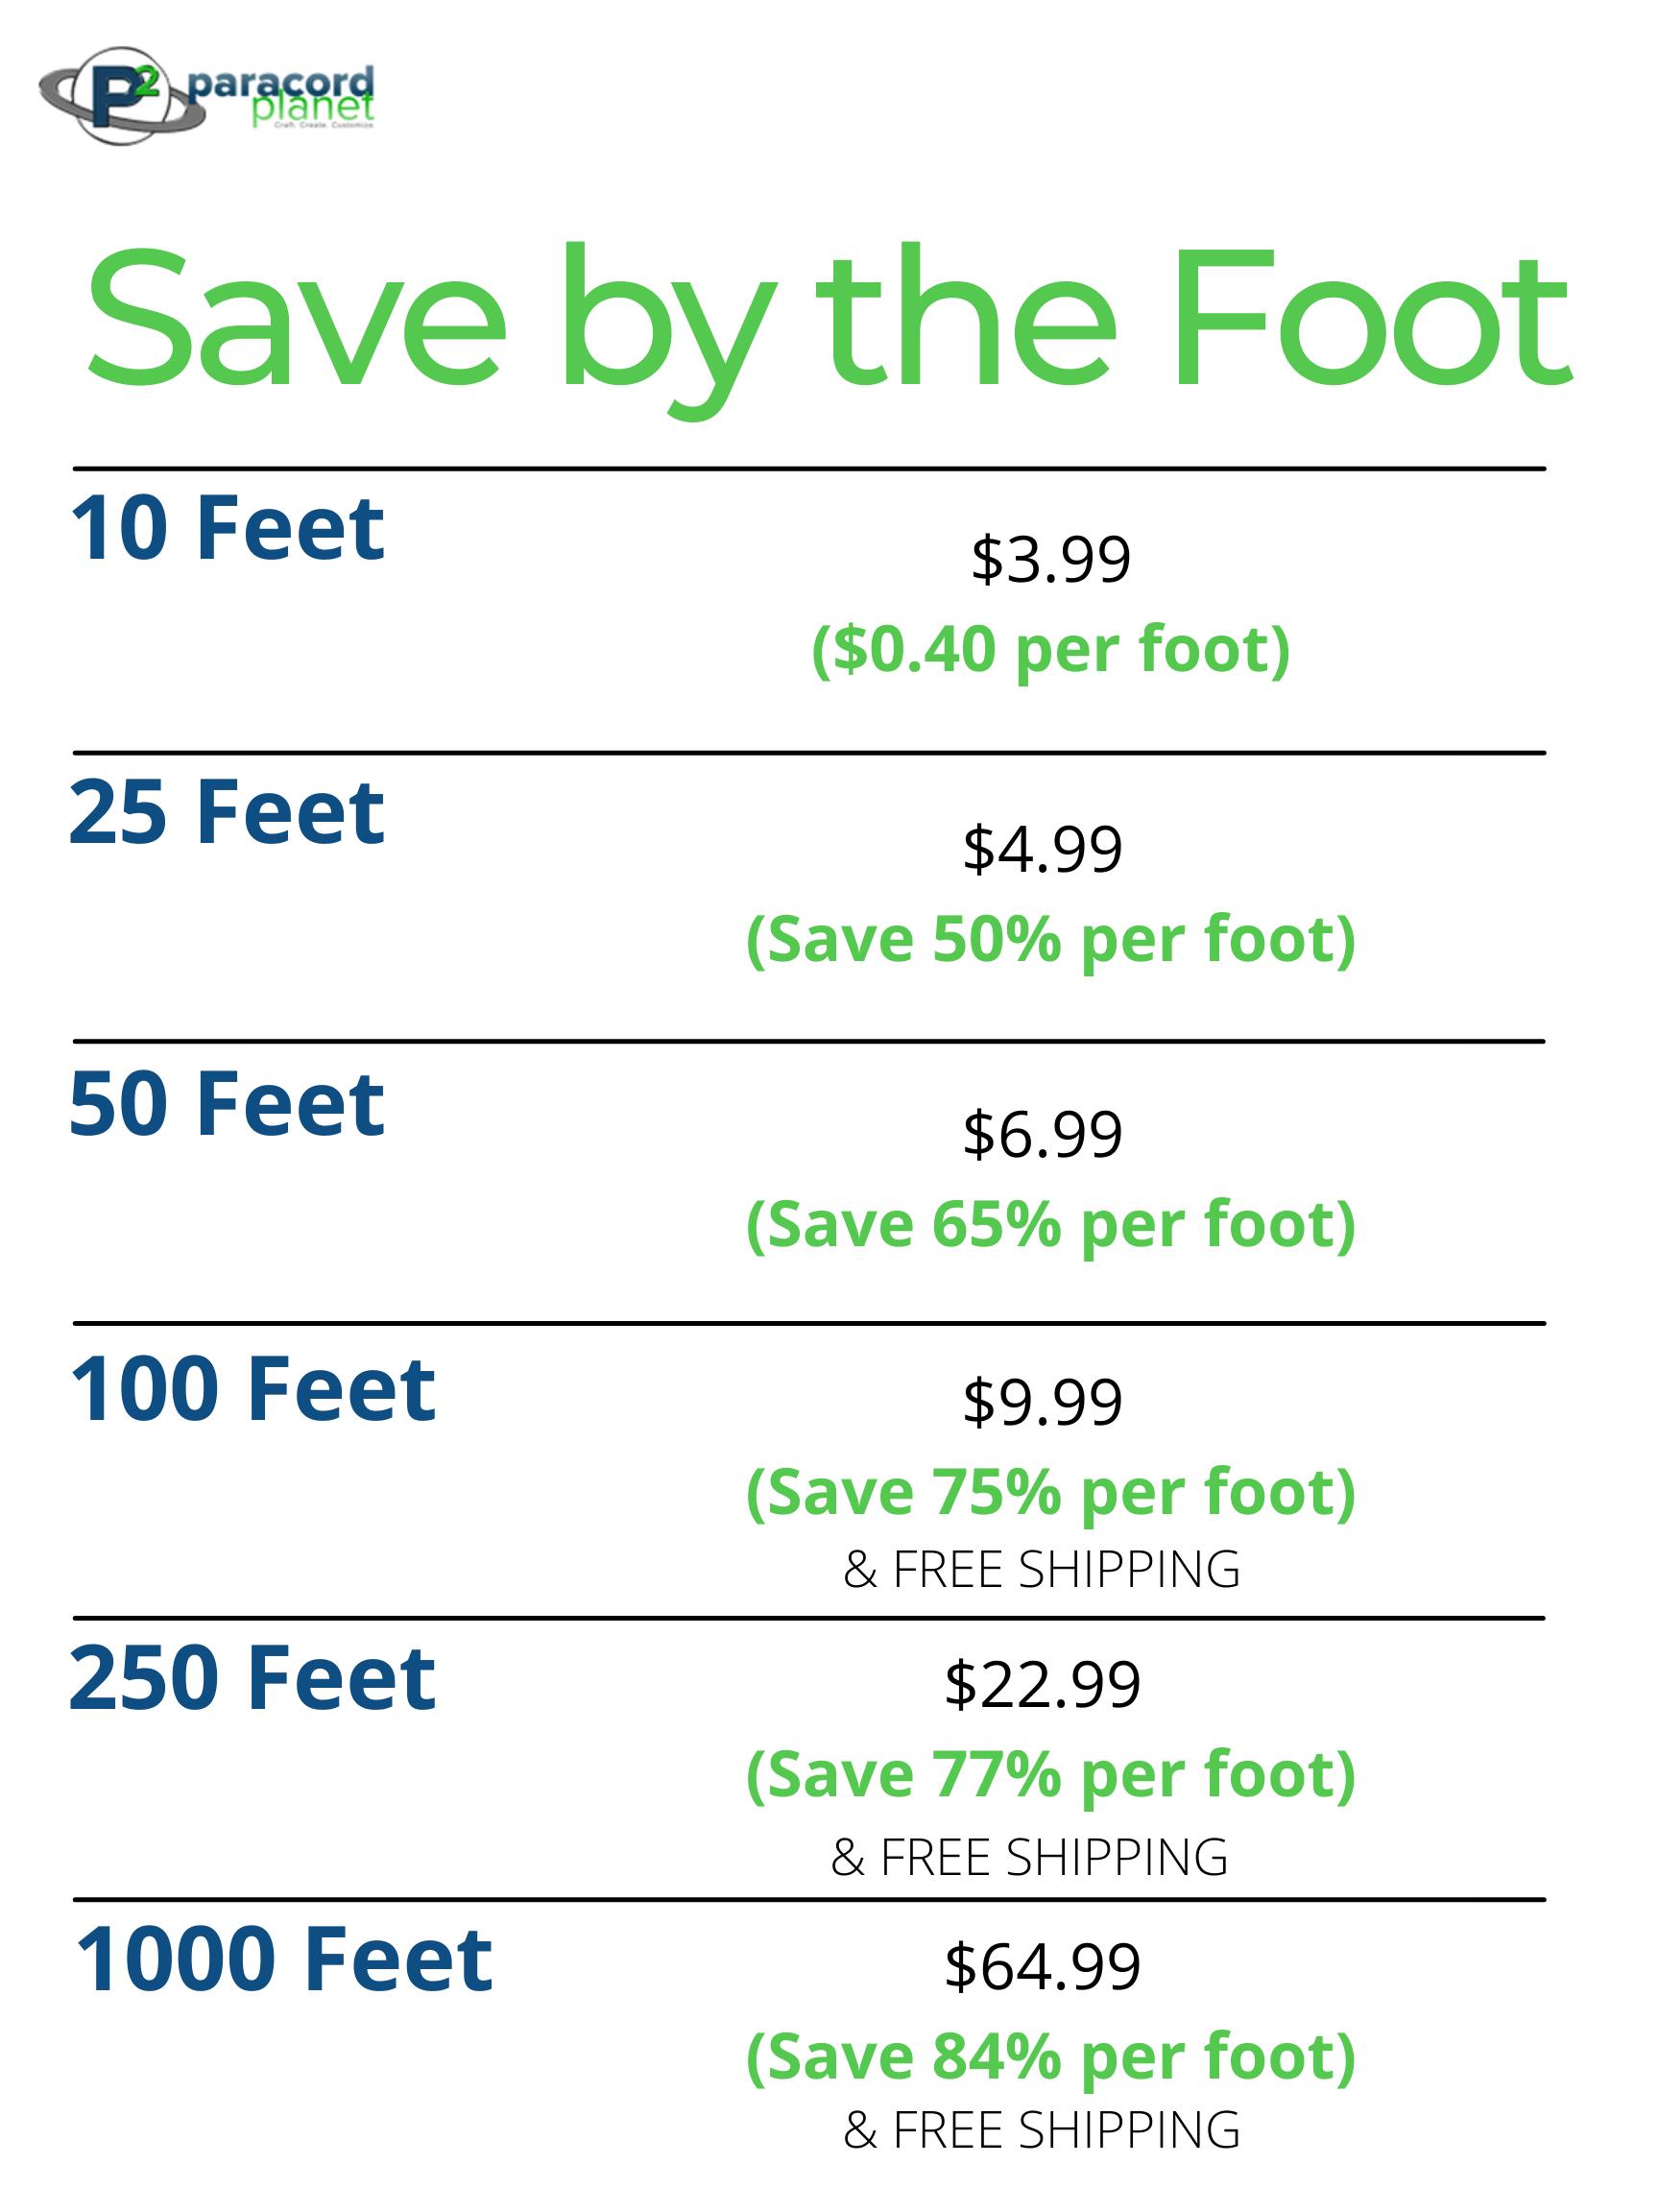 Paracord Planet Savings Percent